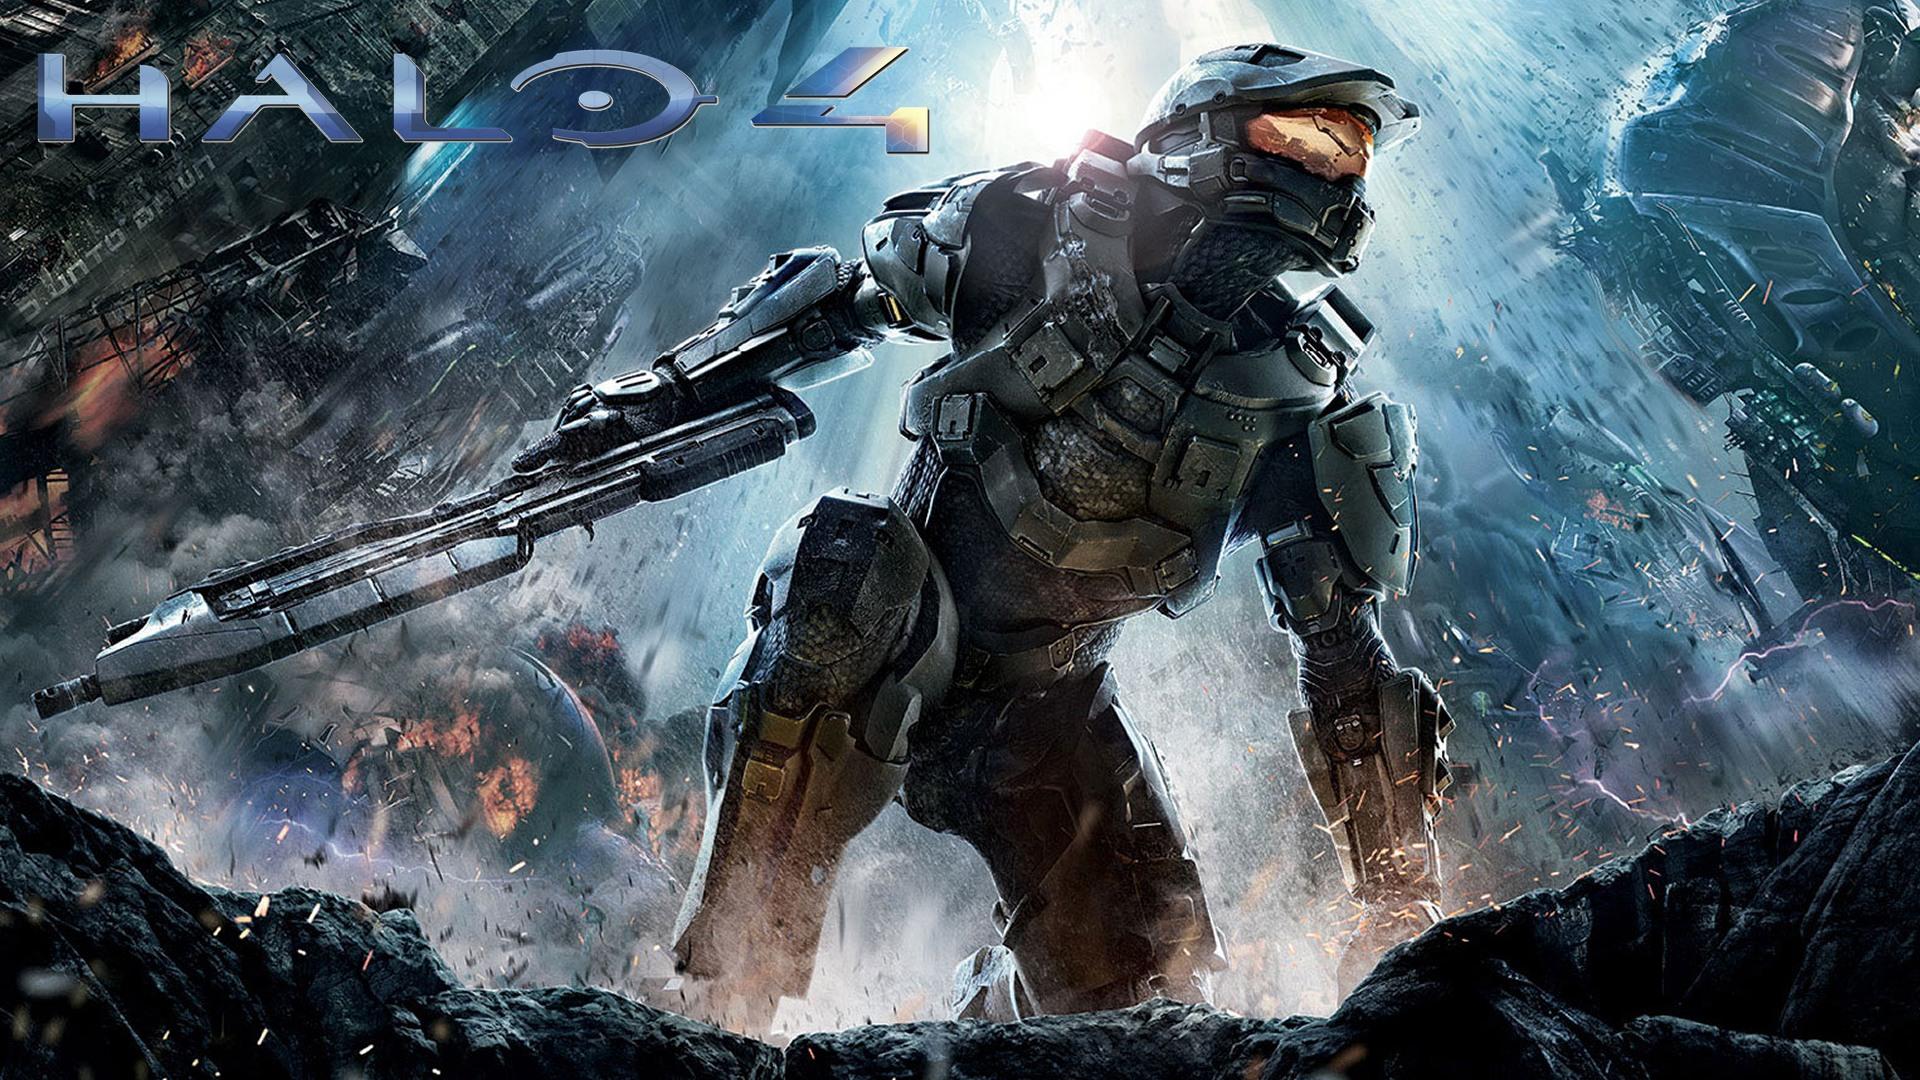 Halo 4 desktop wallpaper 1920x1080